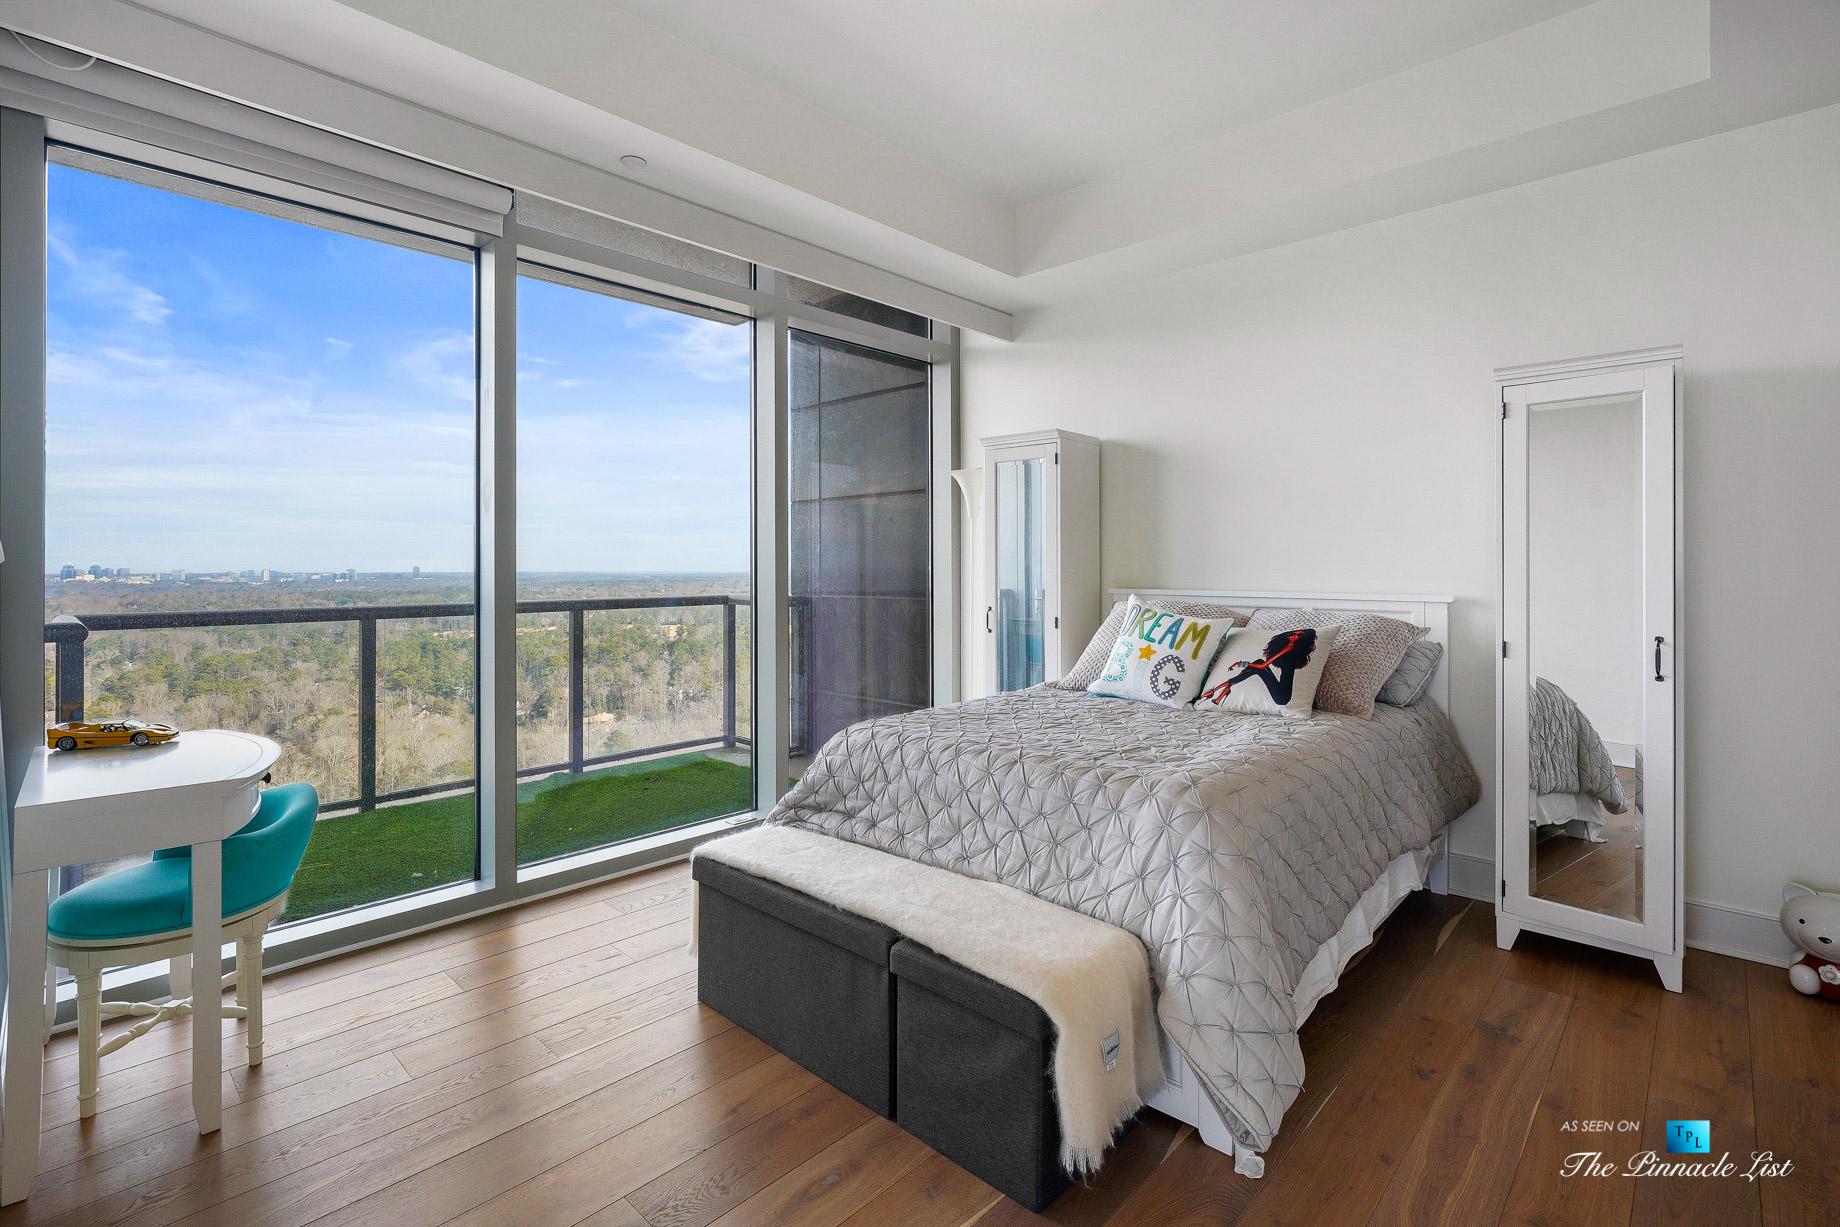 3630 Peachtree Rd NE, Unit 2307, Atlanta, GA, USA - Apartment Bedroom - Luxury Real Estate - Ritz-Carlton Residences Buckhead